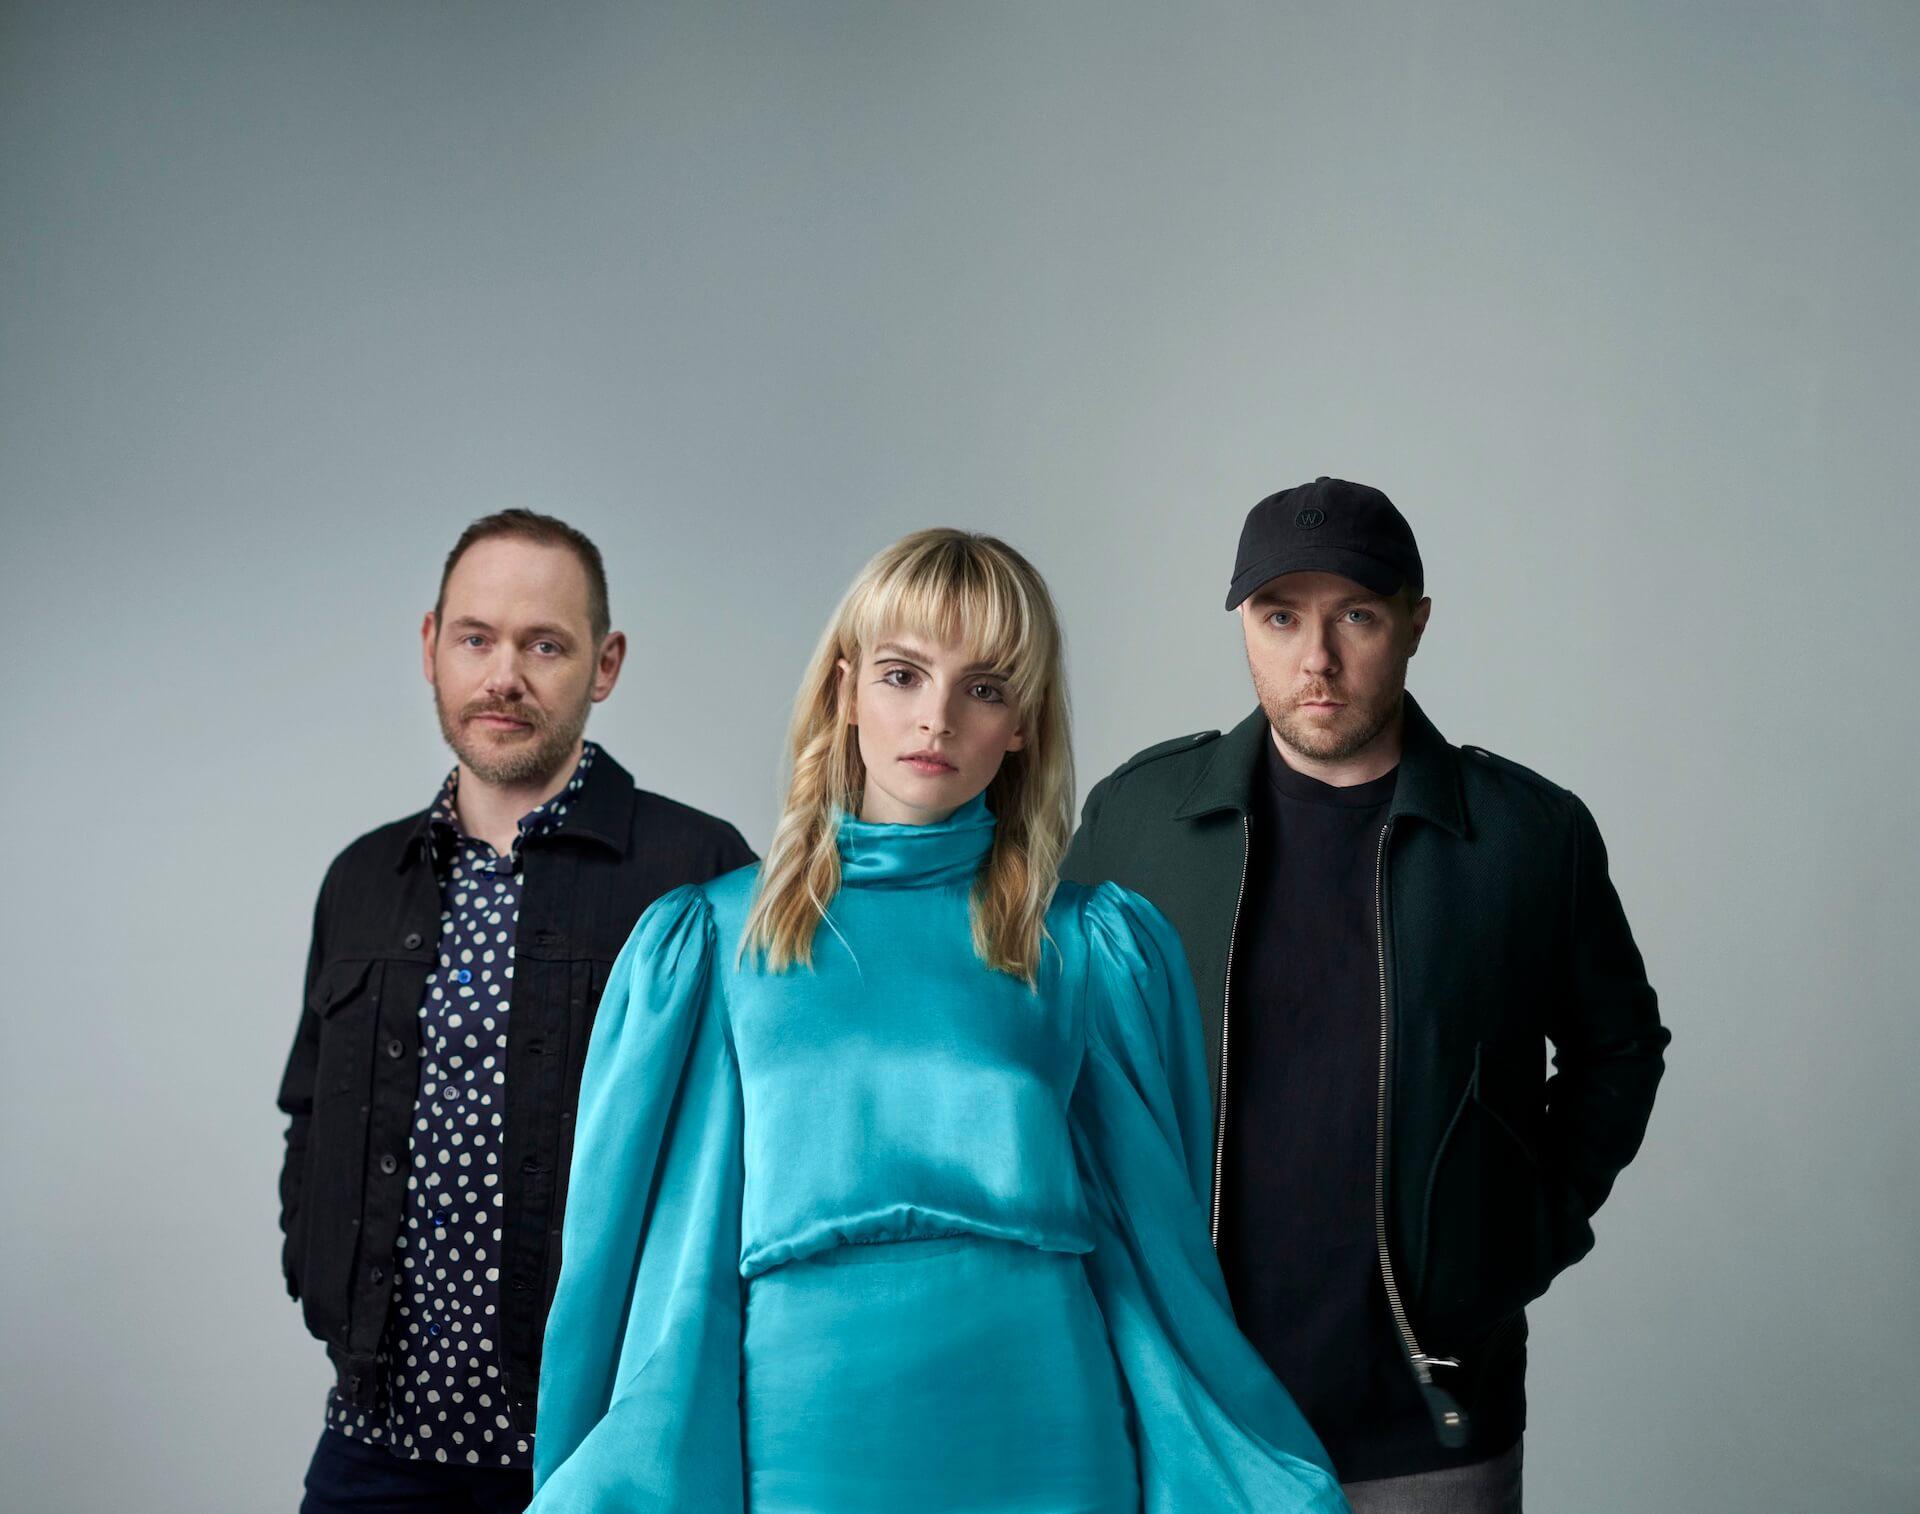 CHVRCHESが生演奏カバー企画『Apple Music Home Session』に初登場!Avril Lavigneのカバー含む2曲が配信開始 music210924_chvrches_02